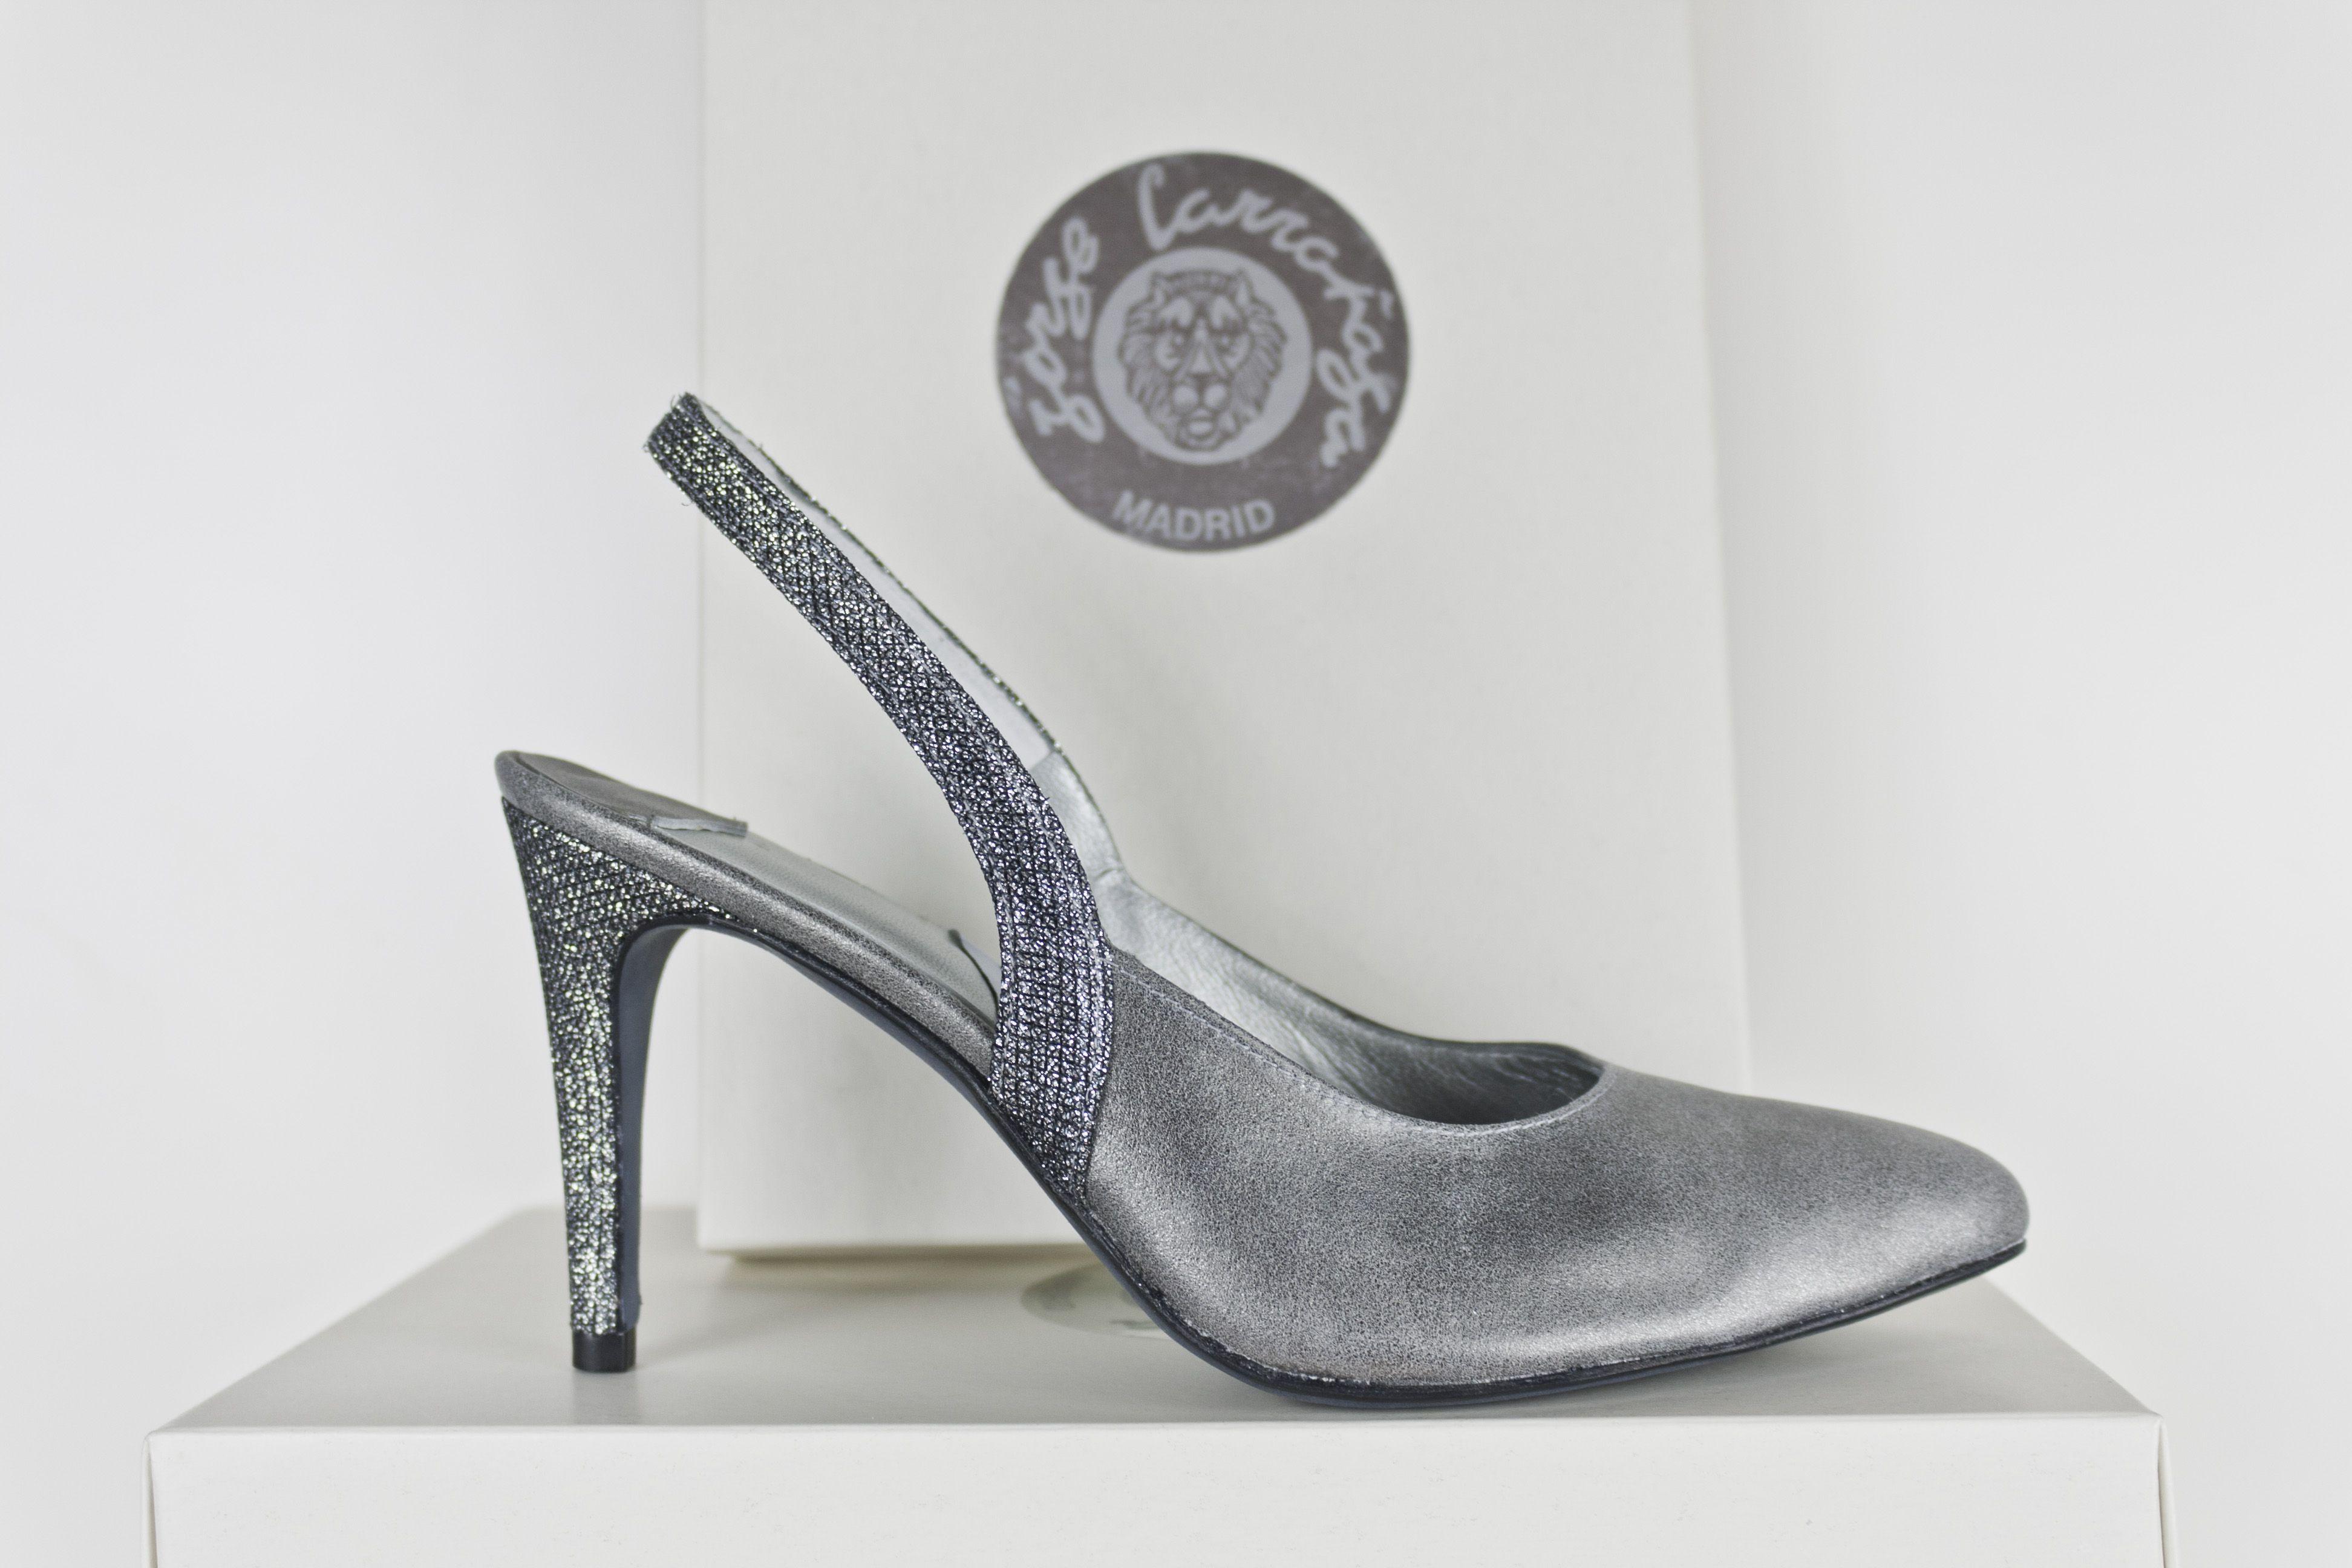 #Zapato #salon #talon #abierto #moda #fashion #fantasia #fiesta #party #shoes #heels #zapatos #calzado #artesanal #madeinspain www.jorgelarranaga.com